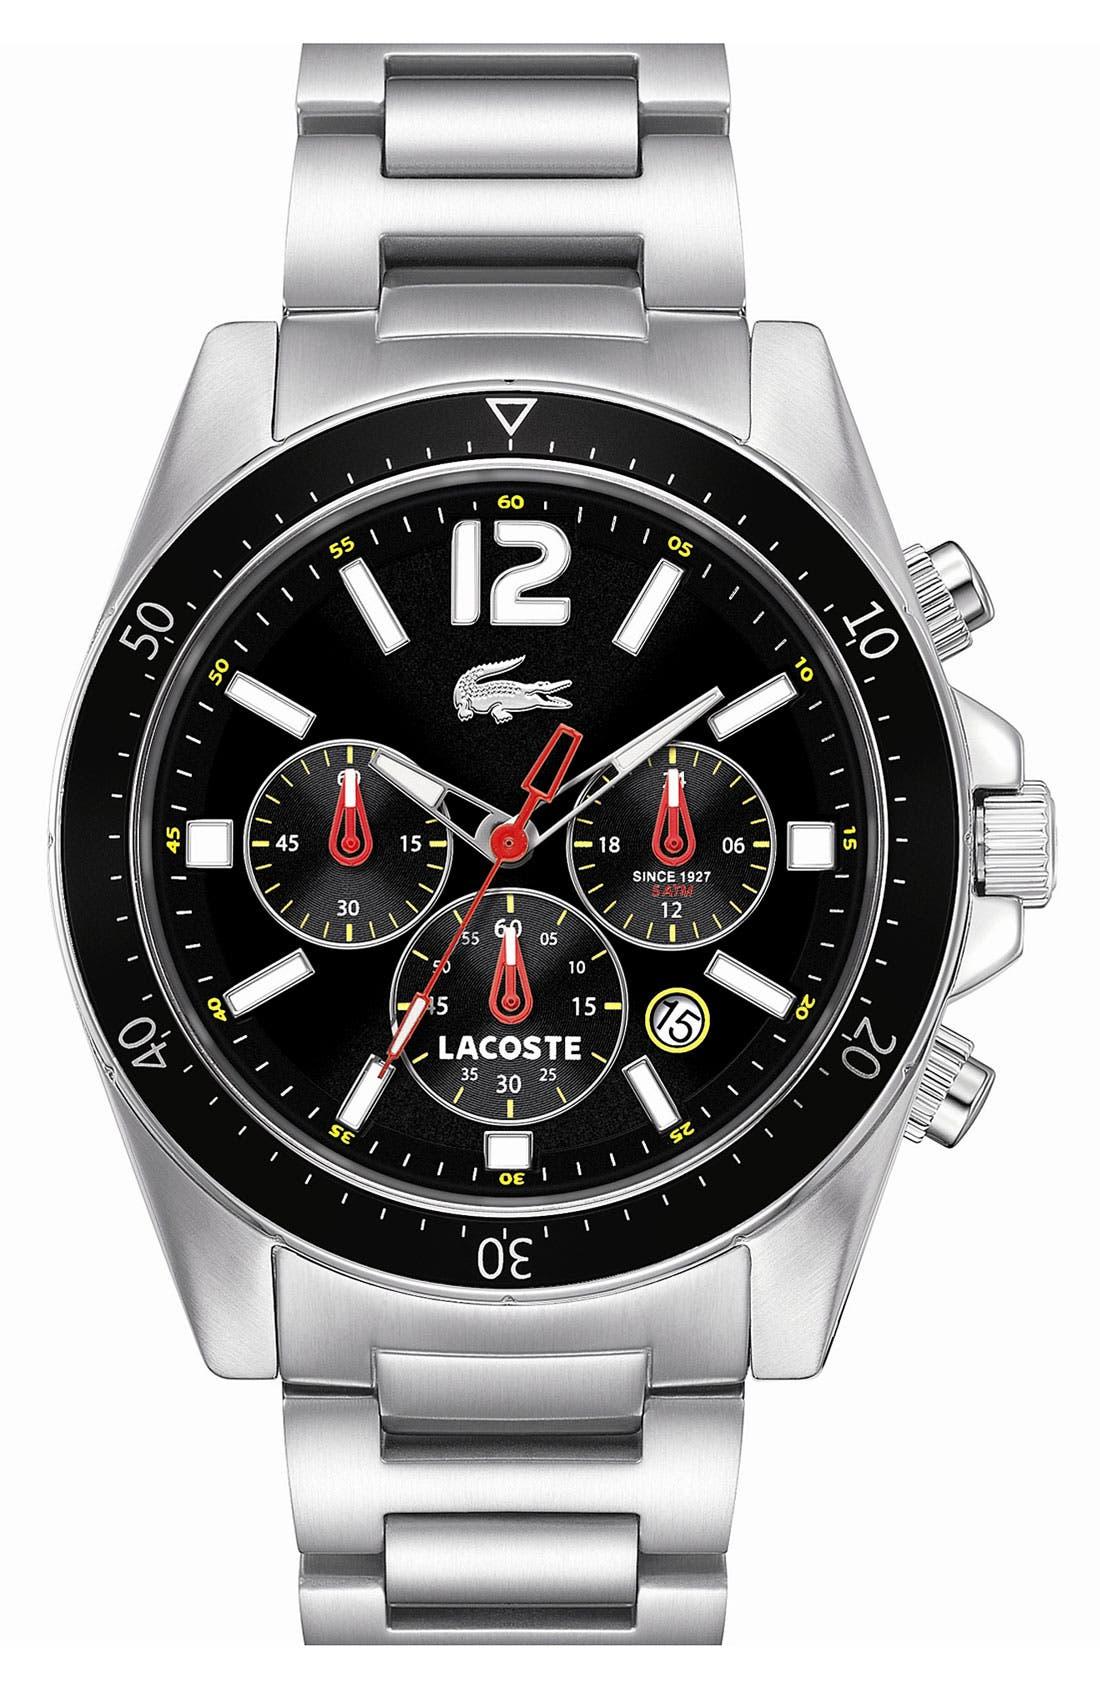 Main Image - Lacoste 'Seattle' Chronograph Aluminum Bezel Bracelet Watch, 43mm